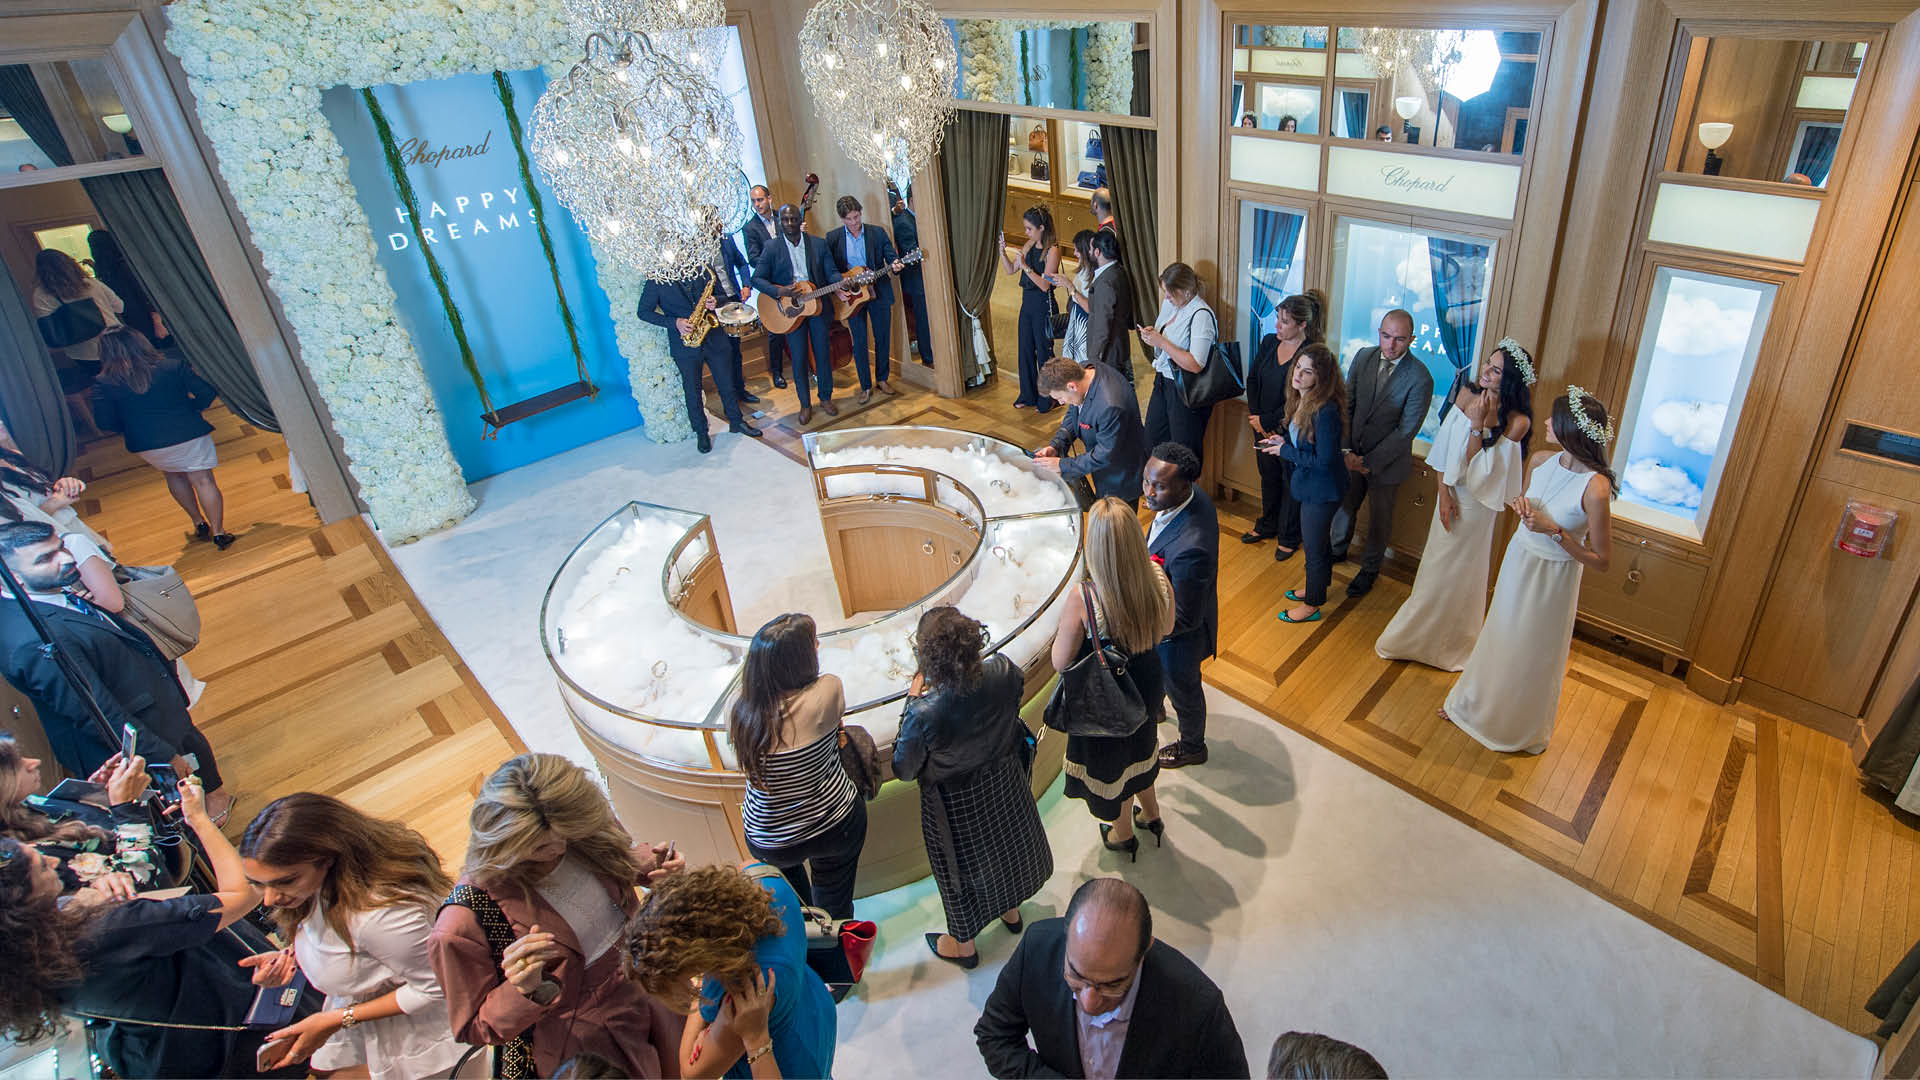 Chopard Hosts Celestial Happy Dreams Event In Dubai